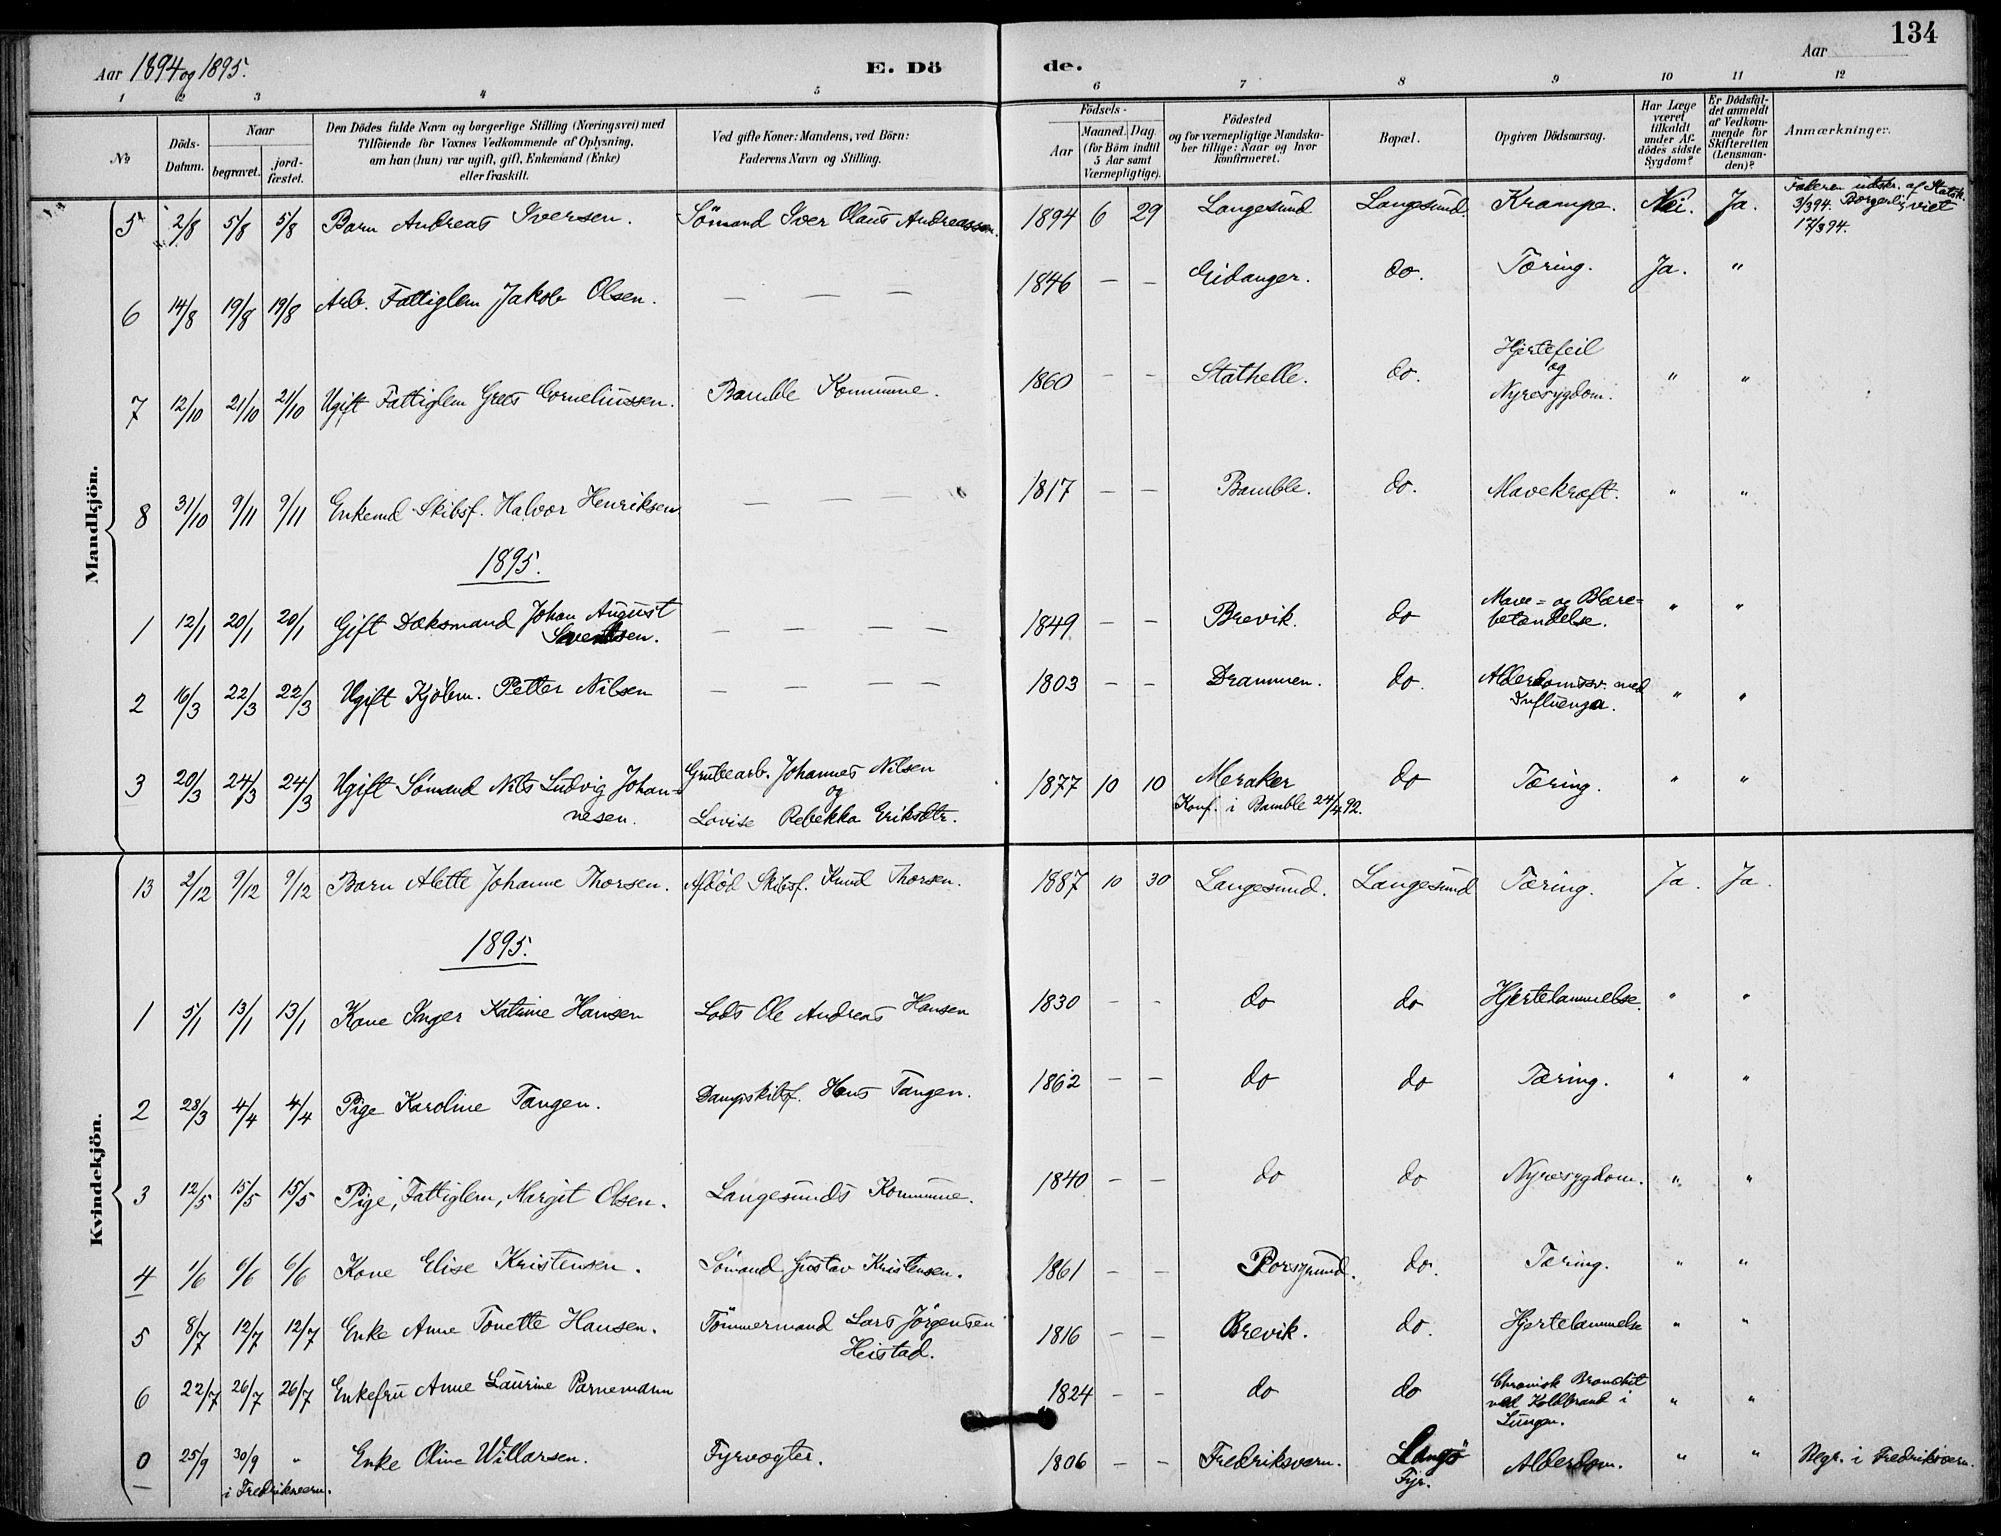 SAKO, Langesund kirkebøker, F/Fa/L0003: Ministerialbok nr. 3, 1893-1907, s. 134